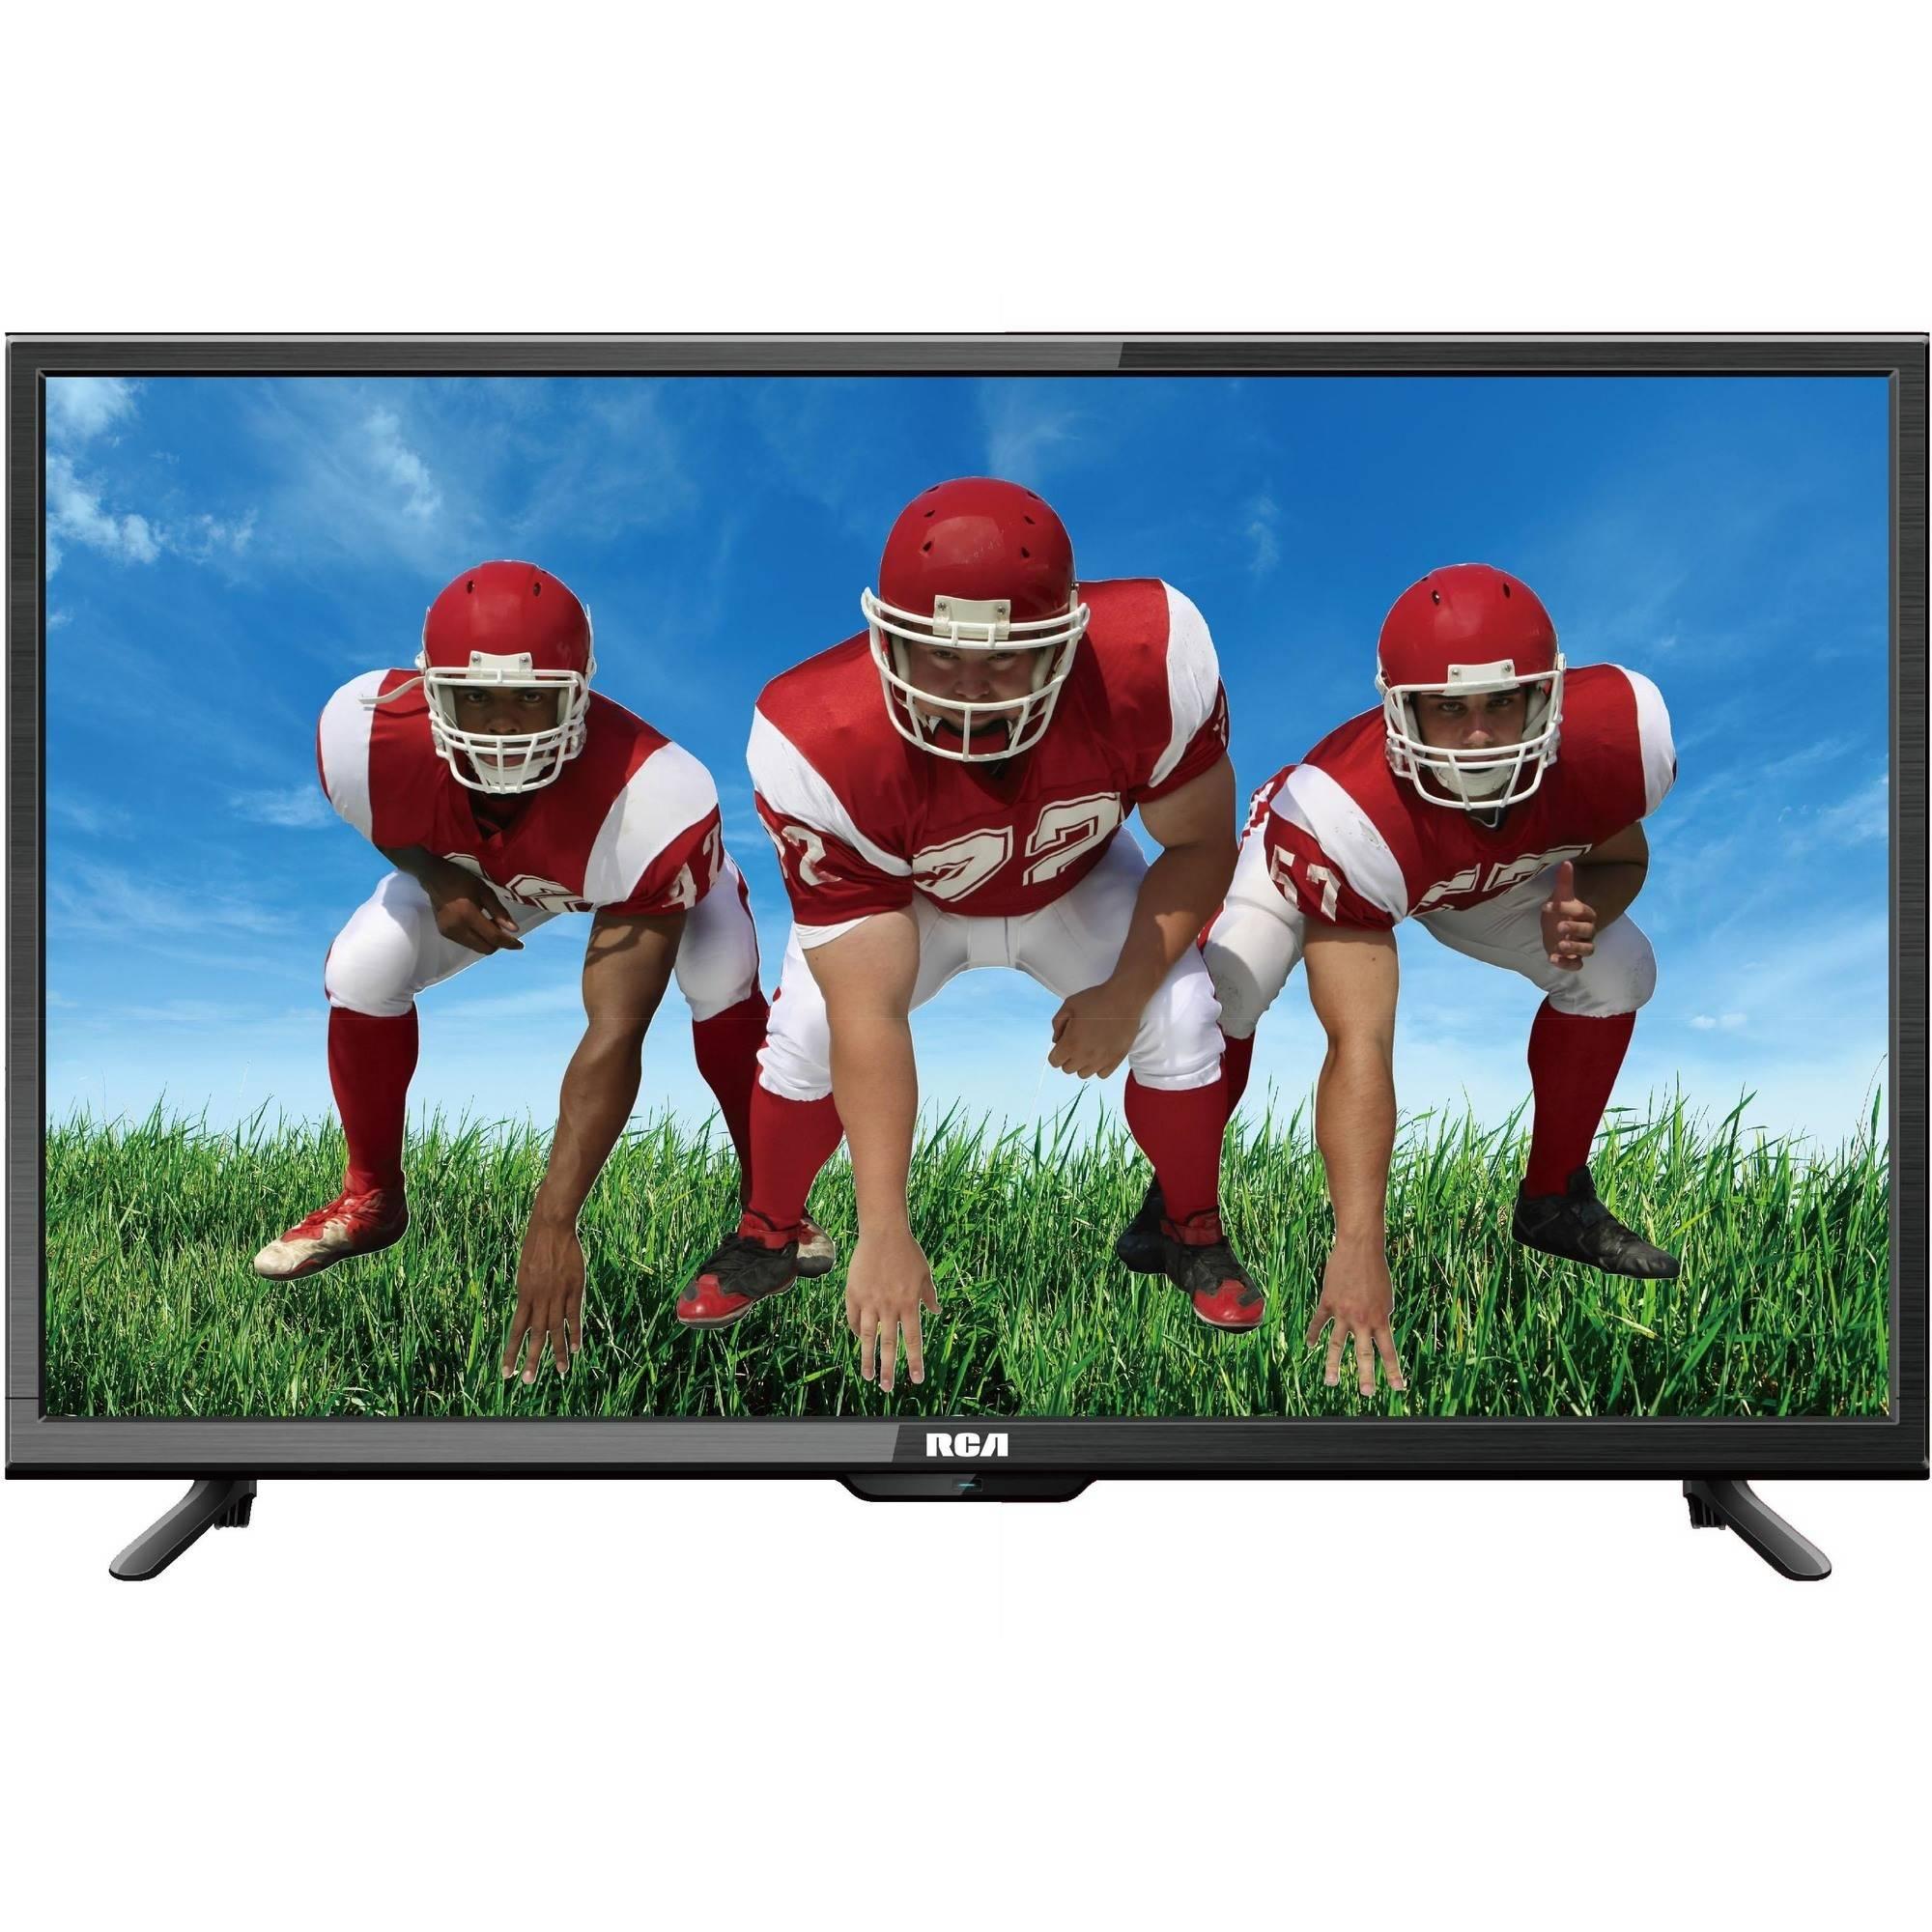 "RCA 32"" Class FHD (1080P) LED TV (RLED3221)"